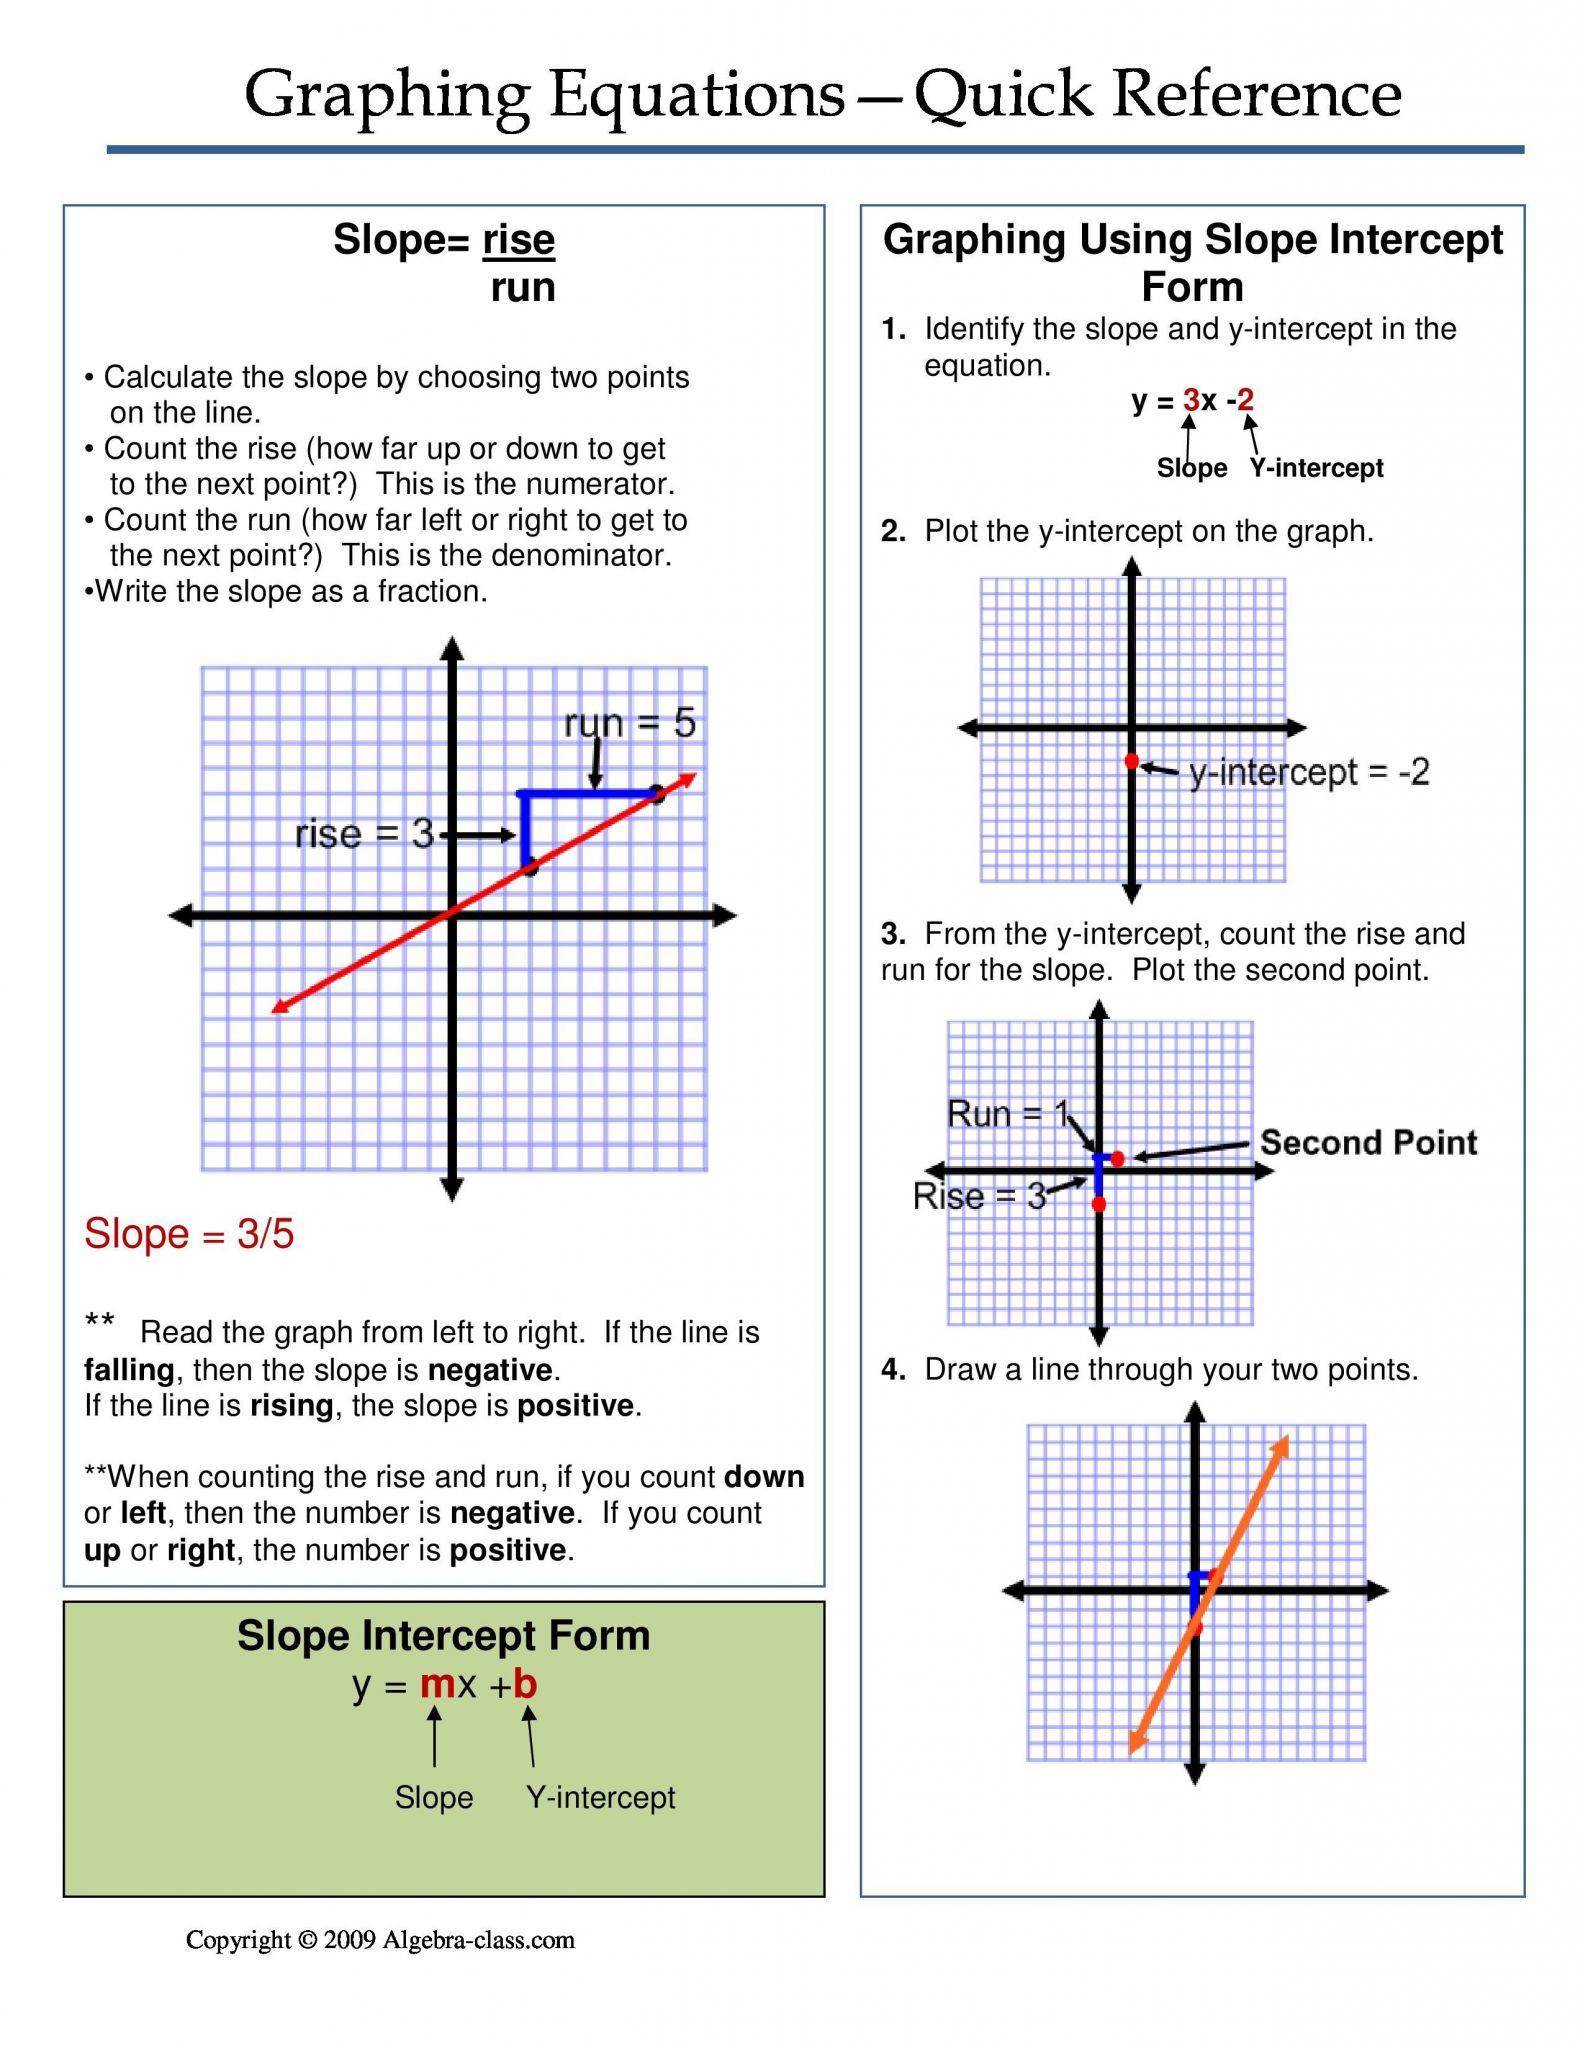 Graphing Slope Intercept Form Worksheet